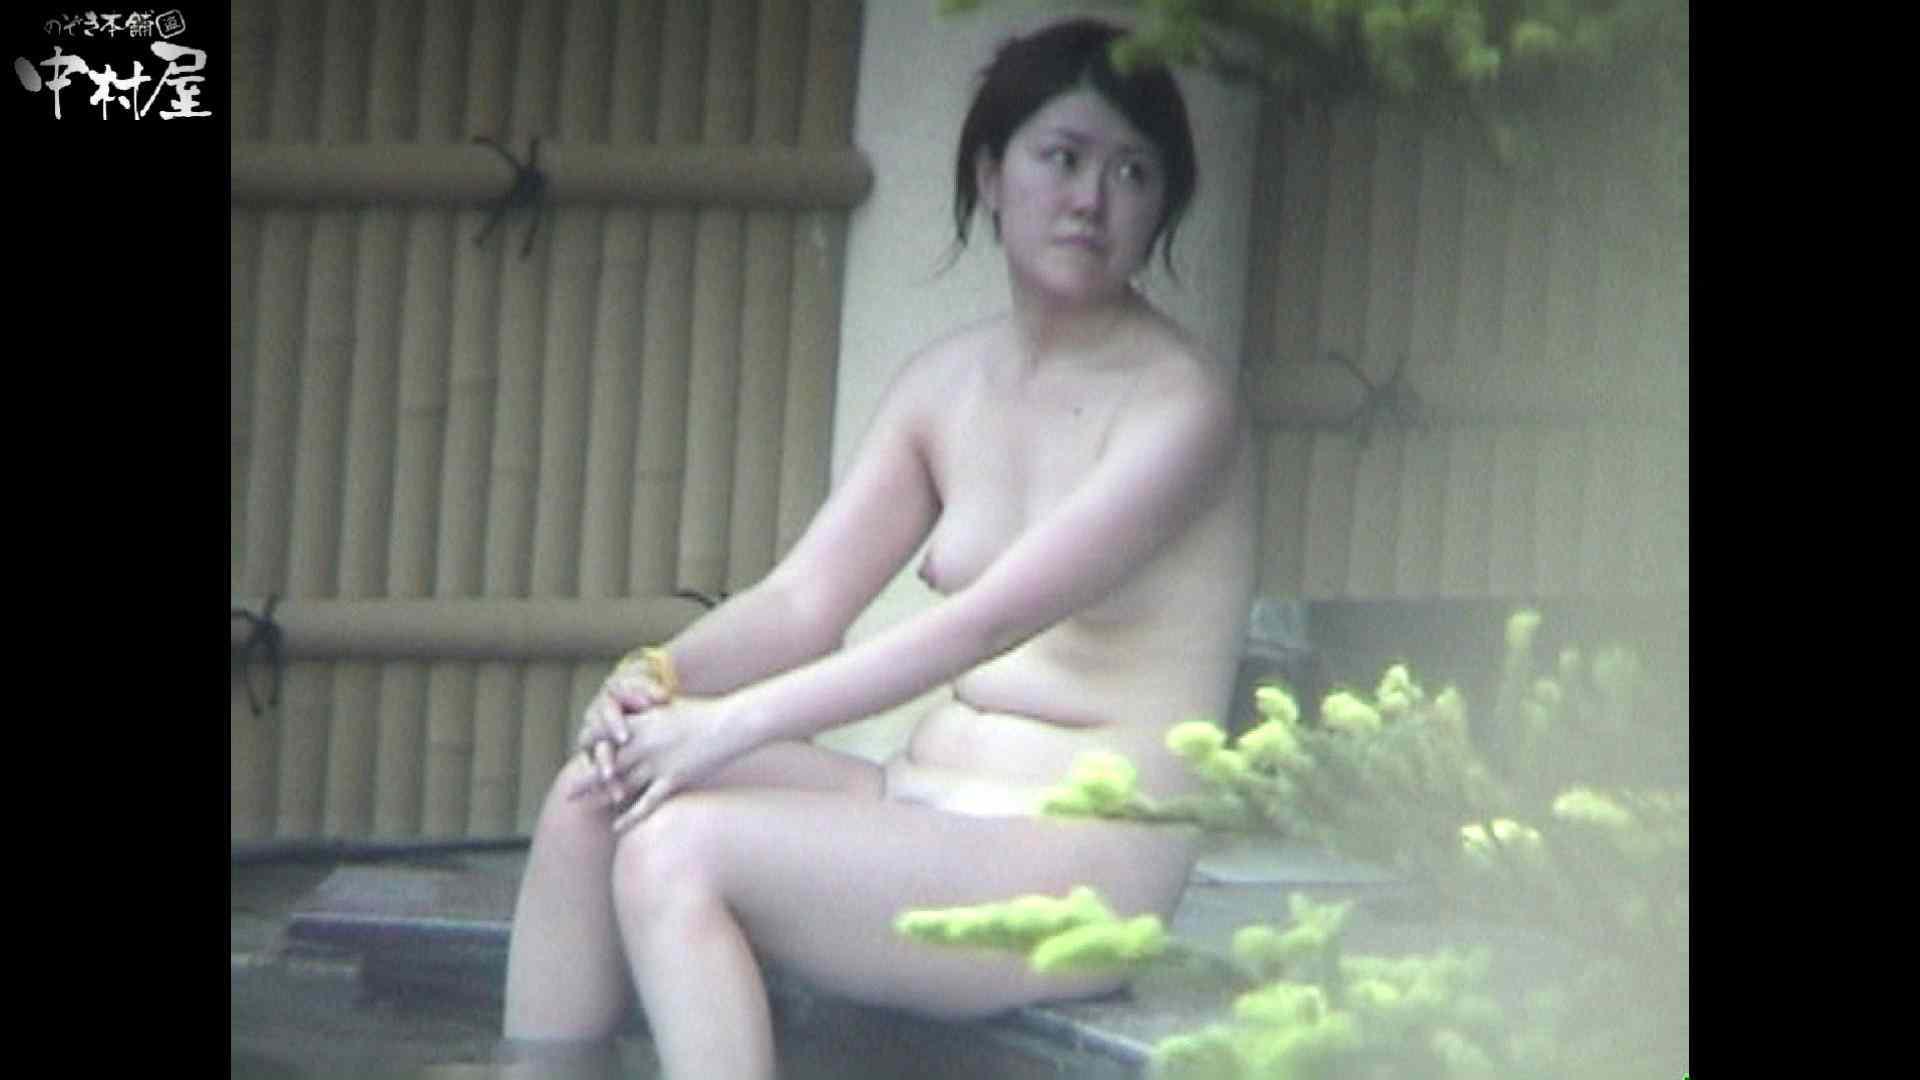 Aquaな露天風呂Vol.935 露天風呂突入 | 美しいOLの裸体  94pic 7